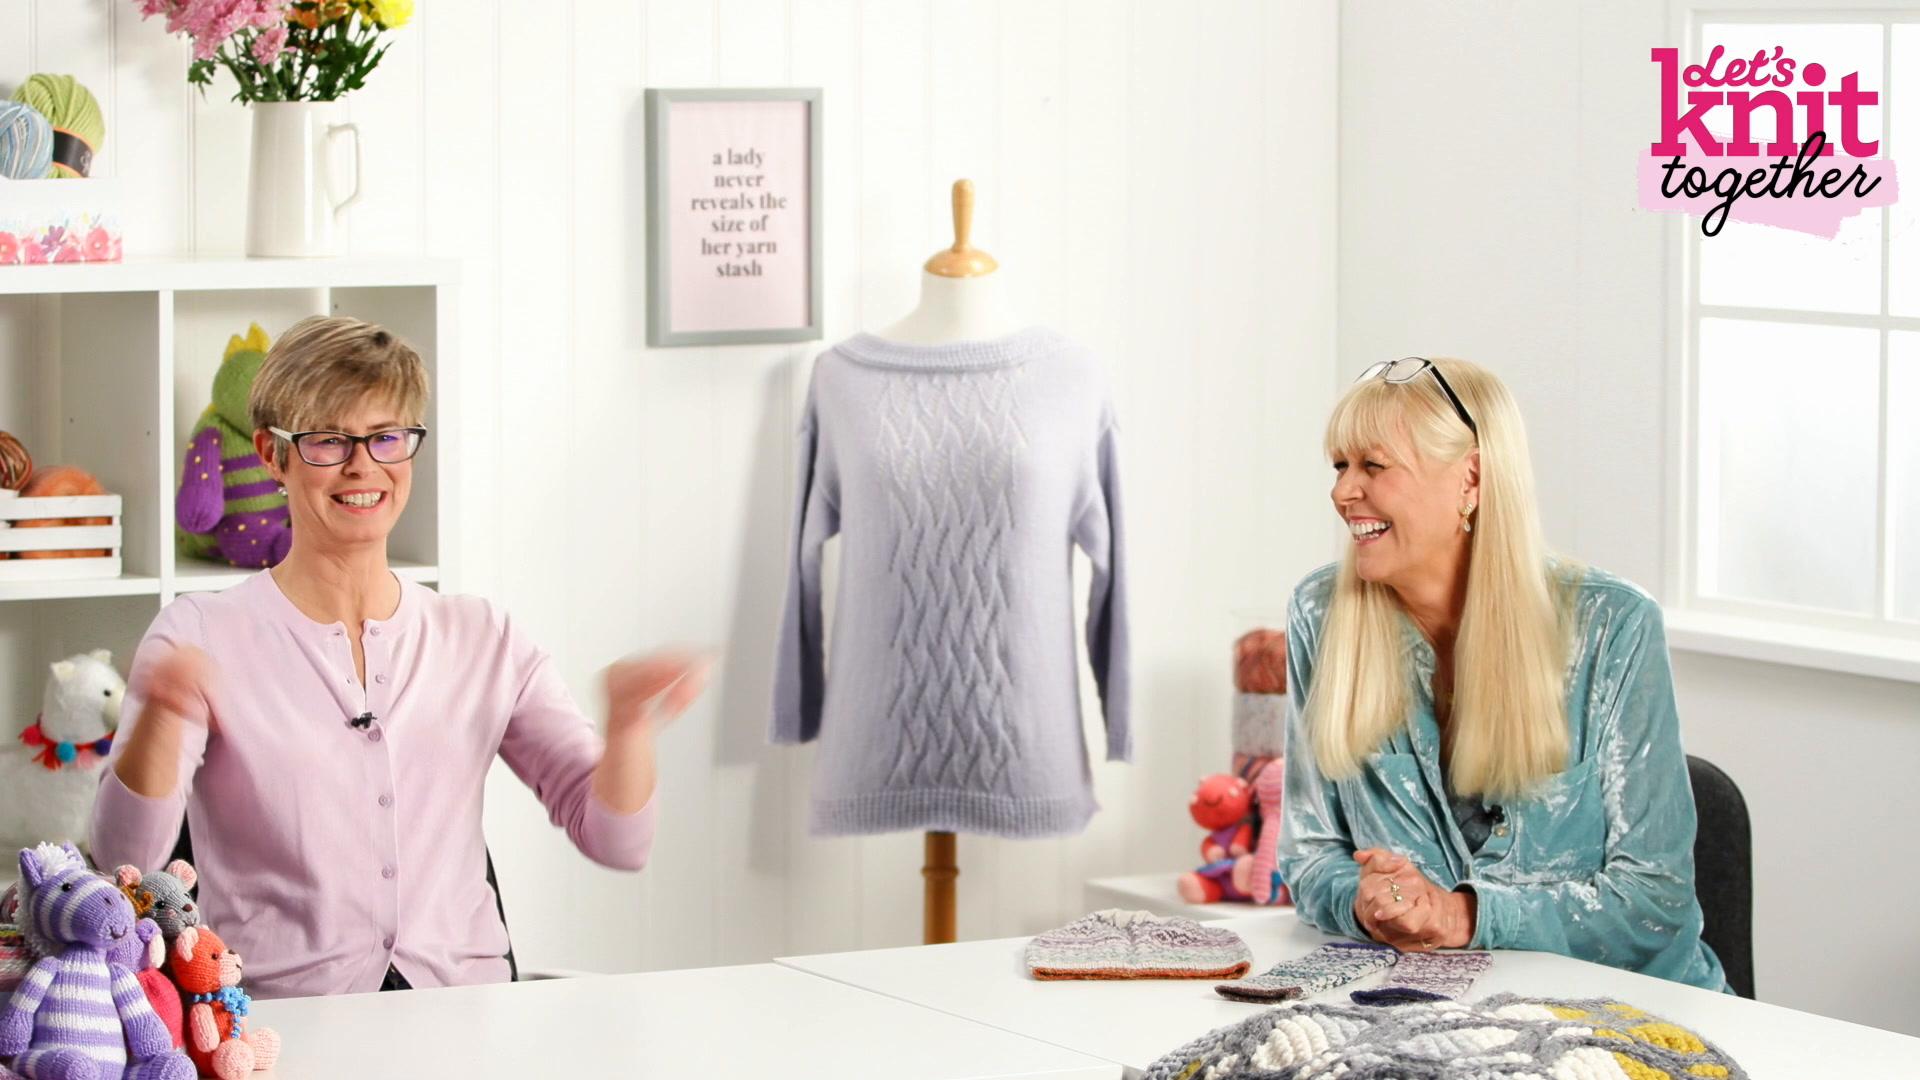 How to: work magic loop knitting